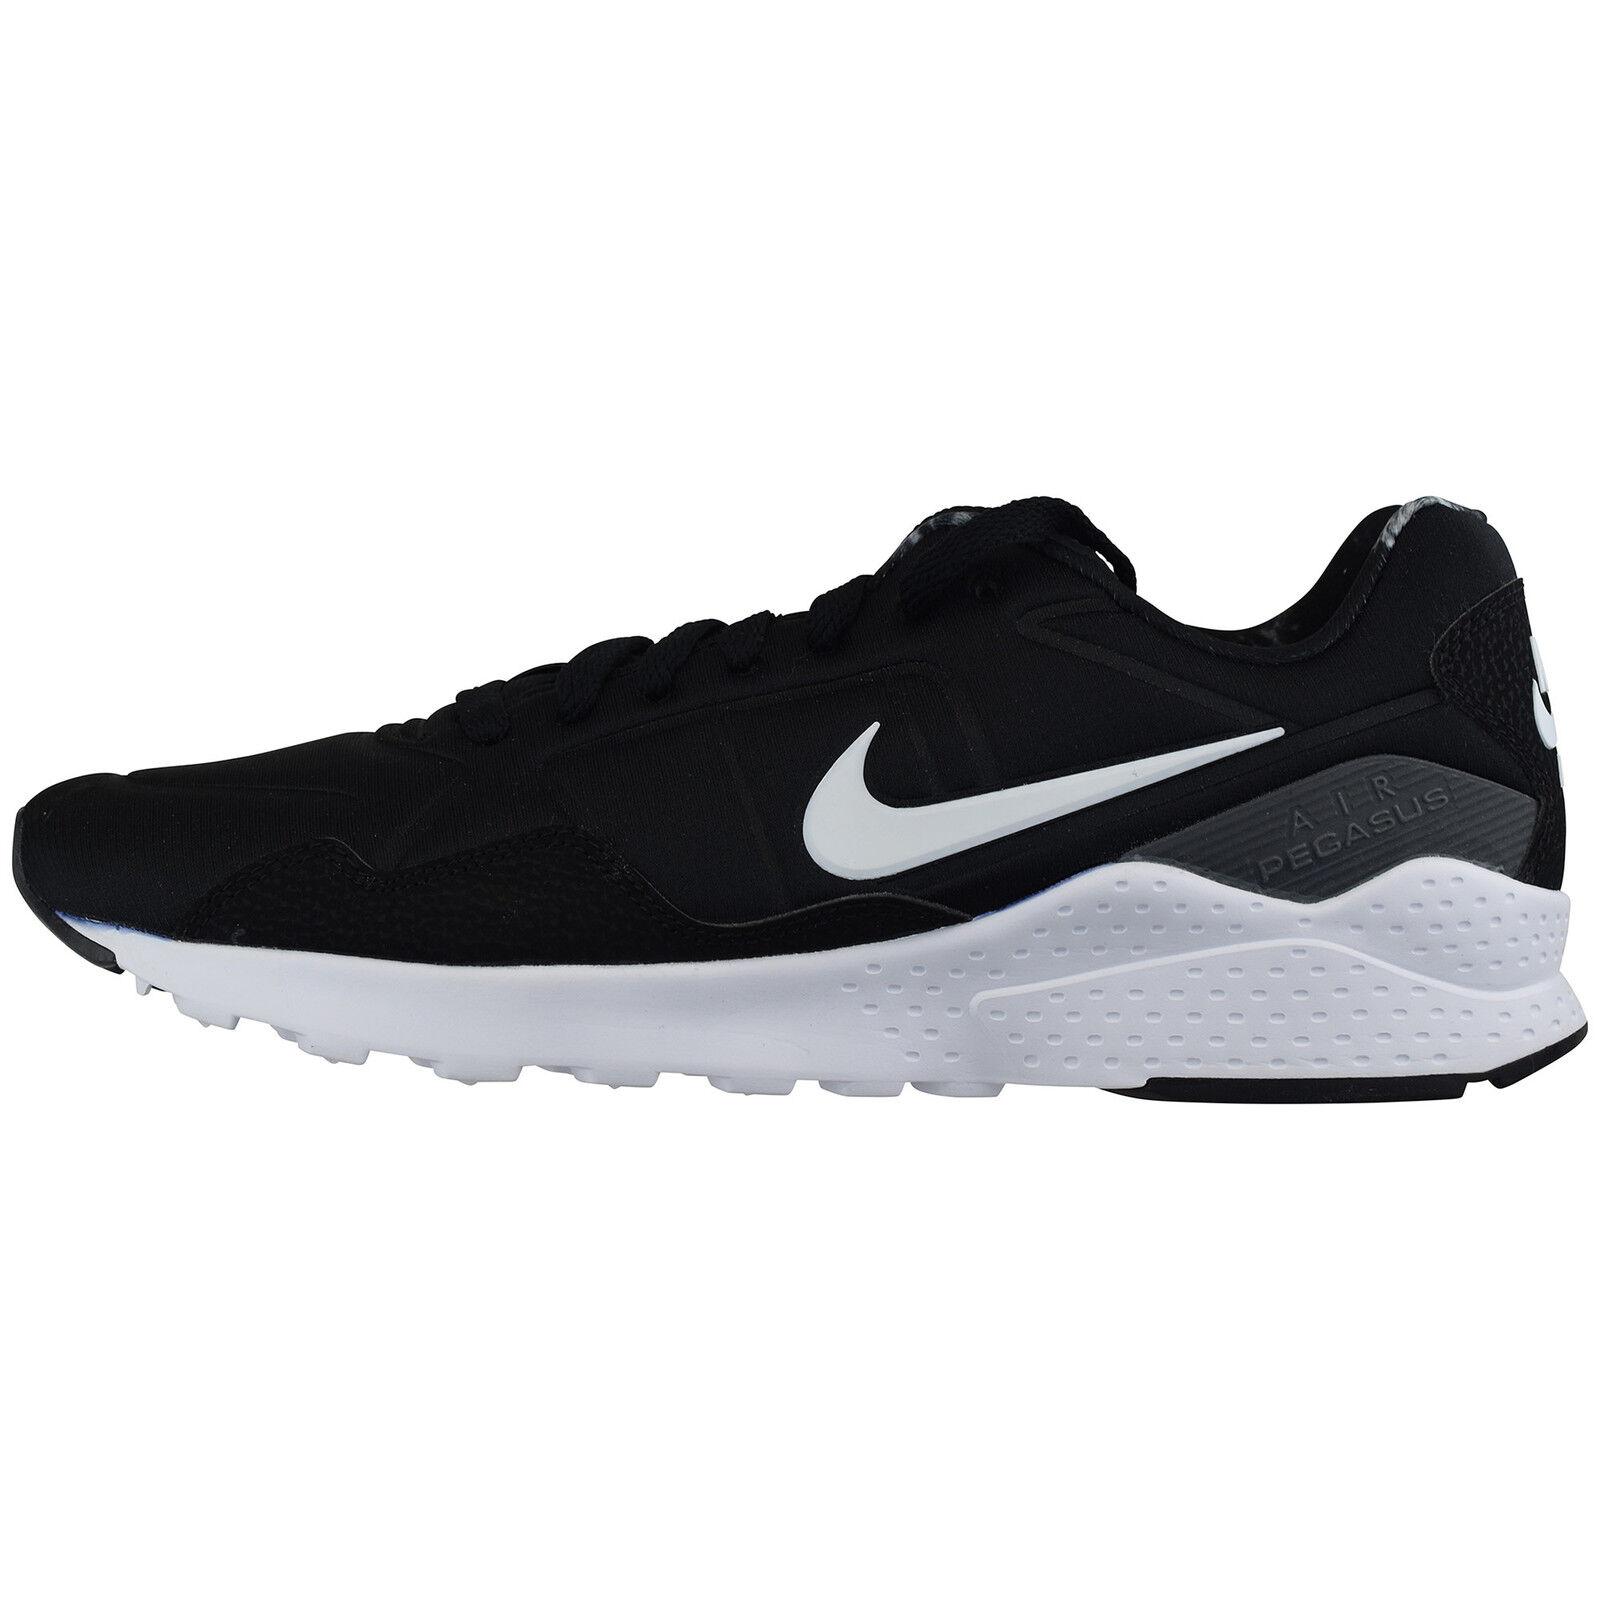 sale retailer 71464 151c4 Nike Zoom Pegasus 92 844652-001 Lifestyle Freizeit Laufschuhe Turnschuhe  Turnschuhe Turnschuhe 5c30f0